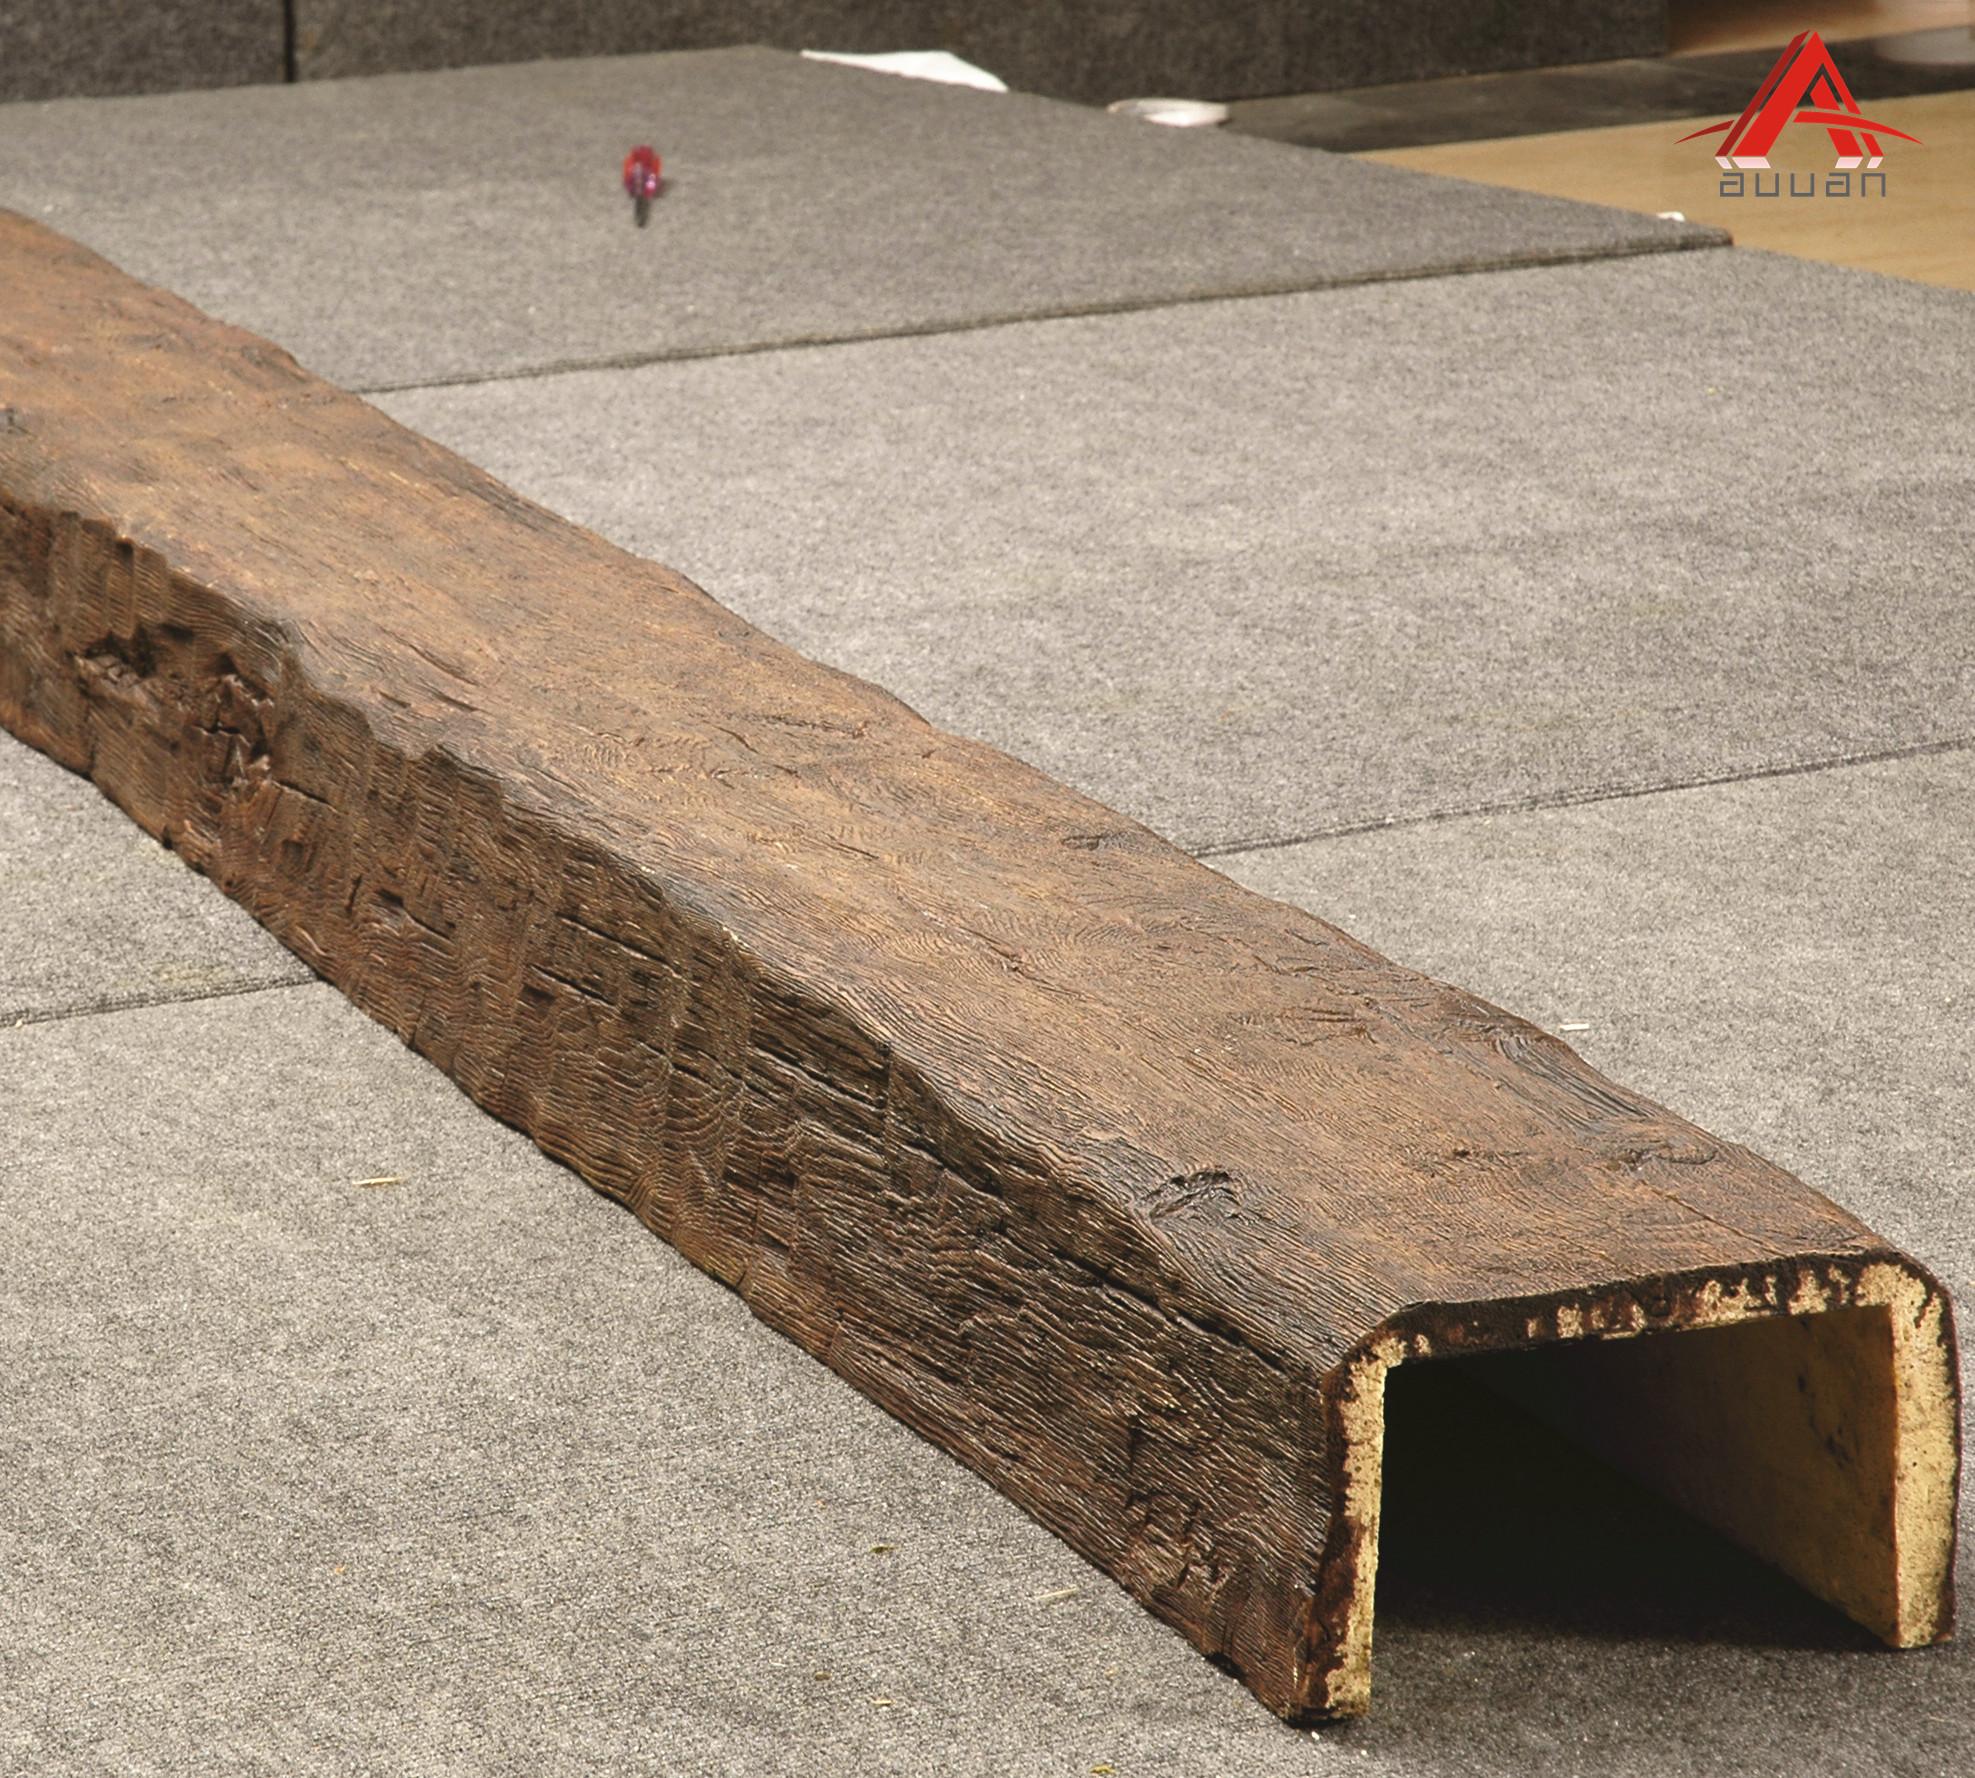 Lows Customize Rustic Pu Polyurethane Faux Wood Beam